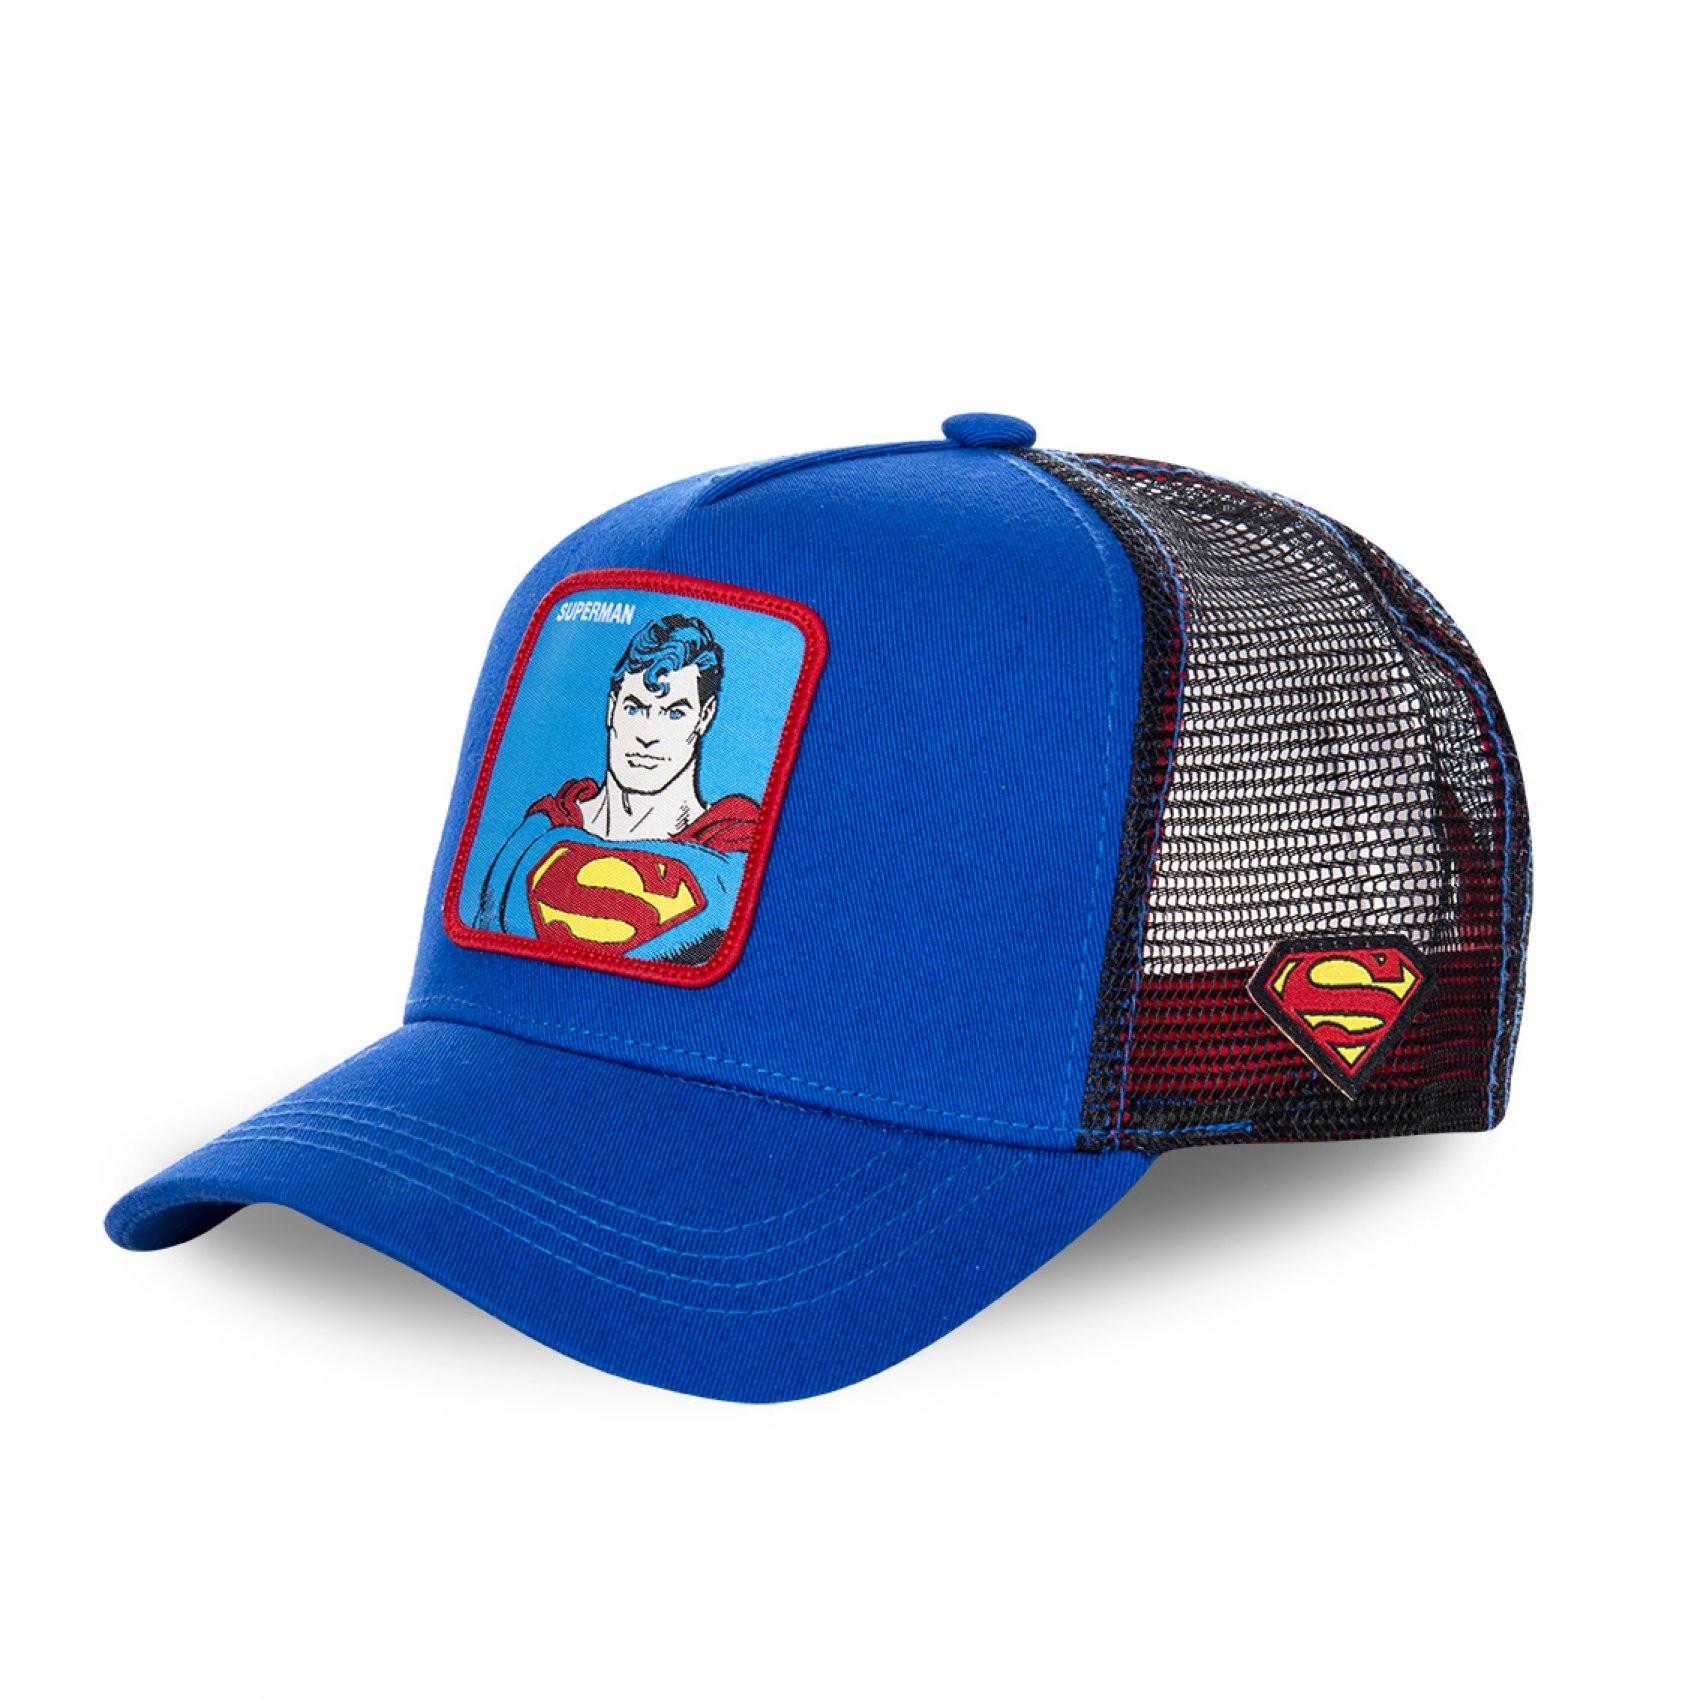 Casquette capslab dc comics superman bleu (photo)